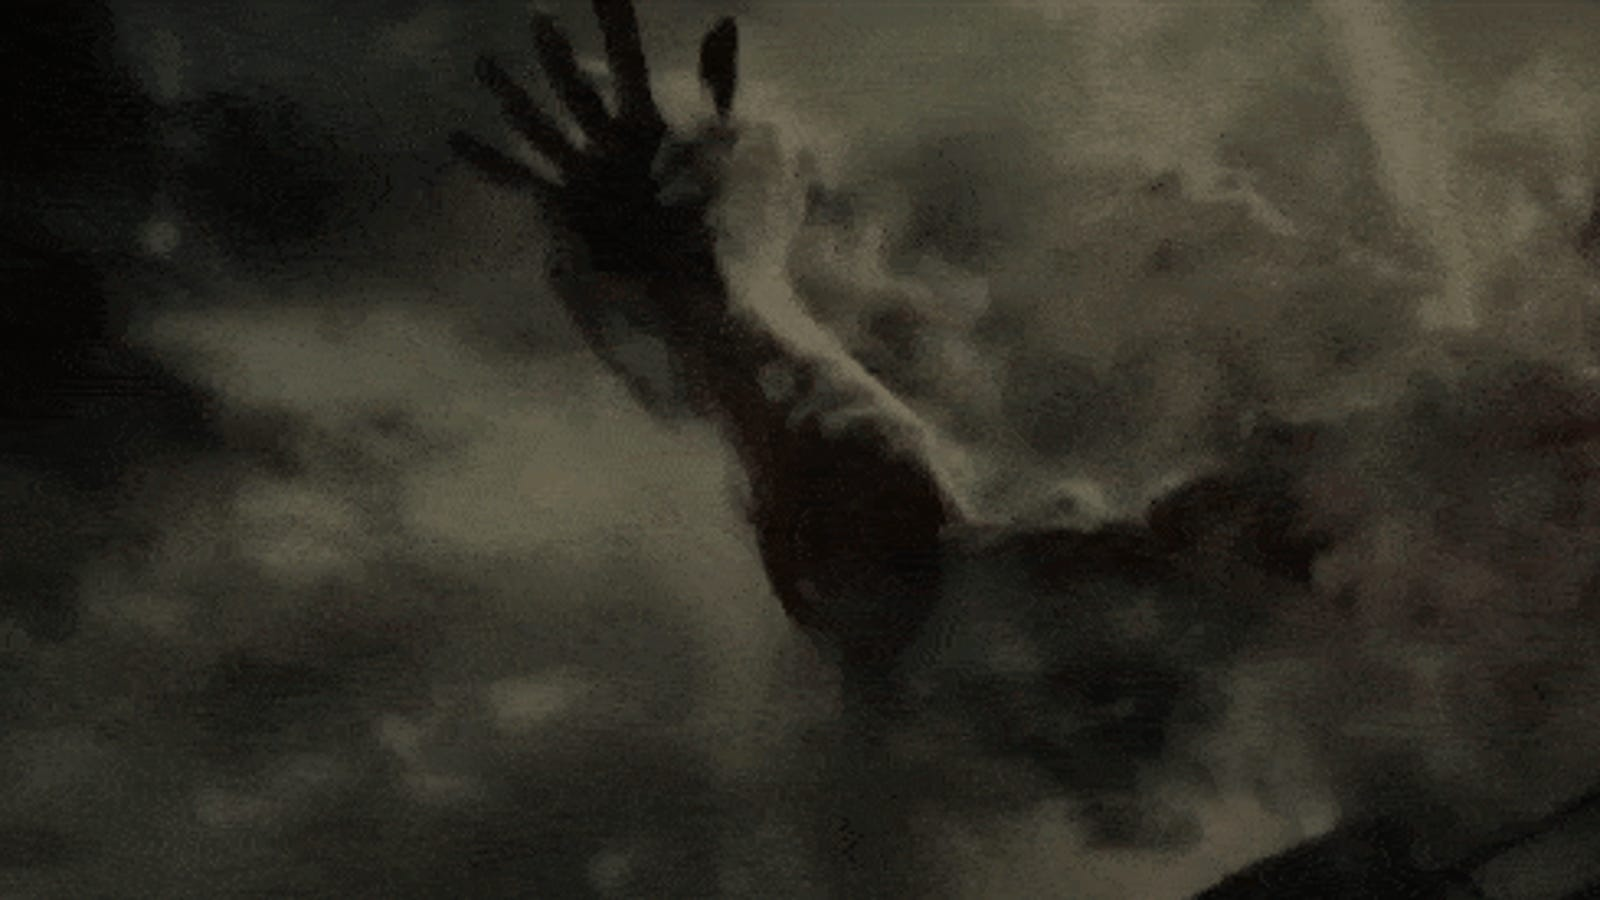 El manga Ataque a los Titanes hecho película se ve espectacular